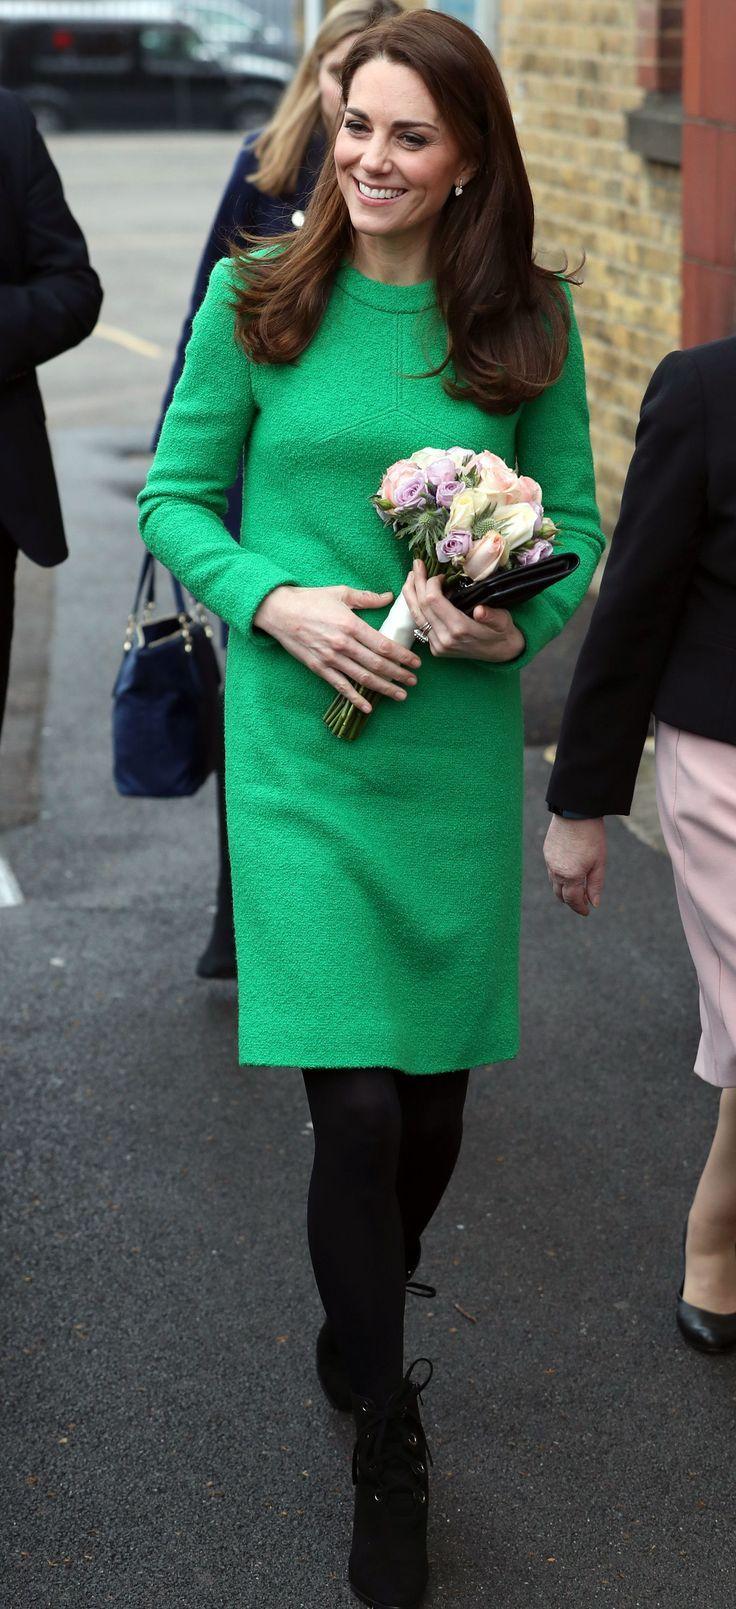 Bright Channels Dress Green Jackie Kate Kennedy Middleton Shift Katemiddleton Channels Jackiekennedy In A Bright Green Dress Royals Etuikleid